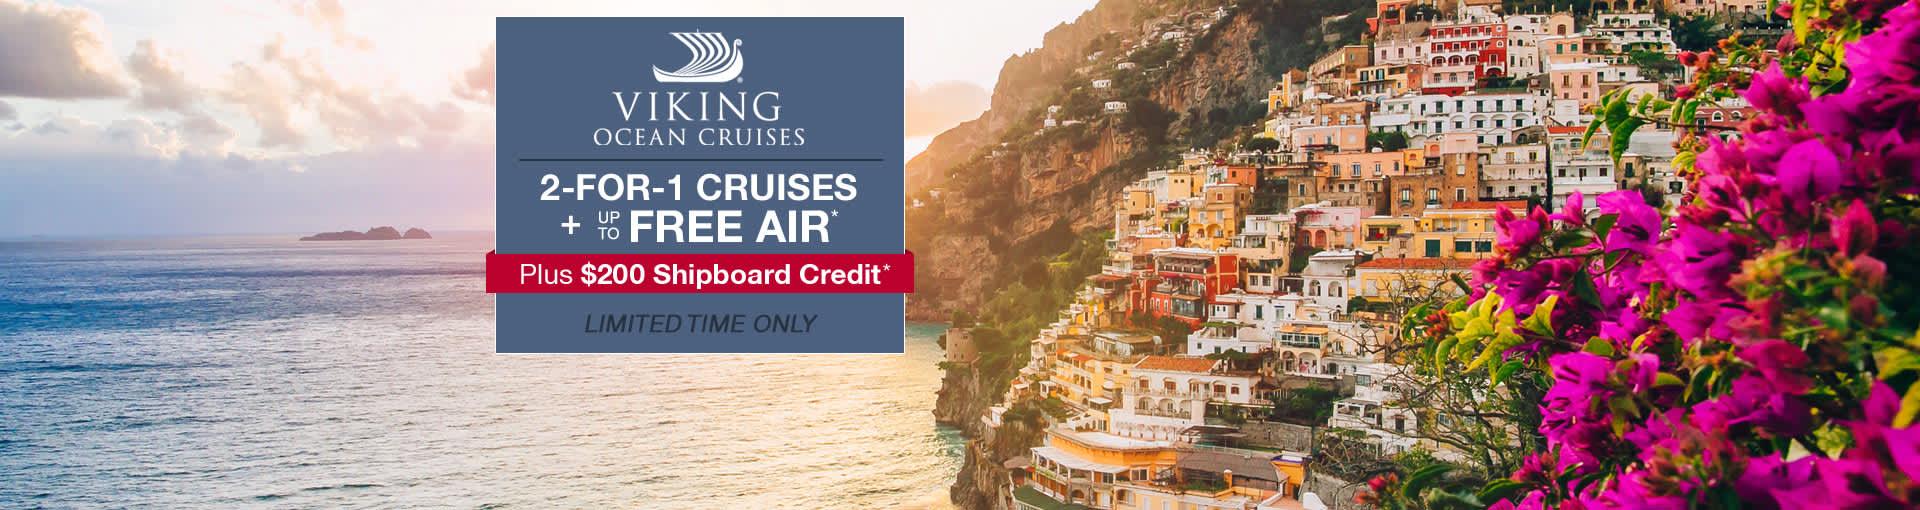 Viking Ocean Cruises: 2-for-1 Cruises plus up to FREE Airfare